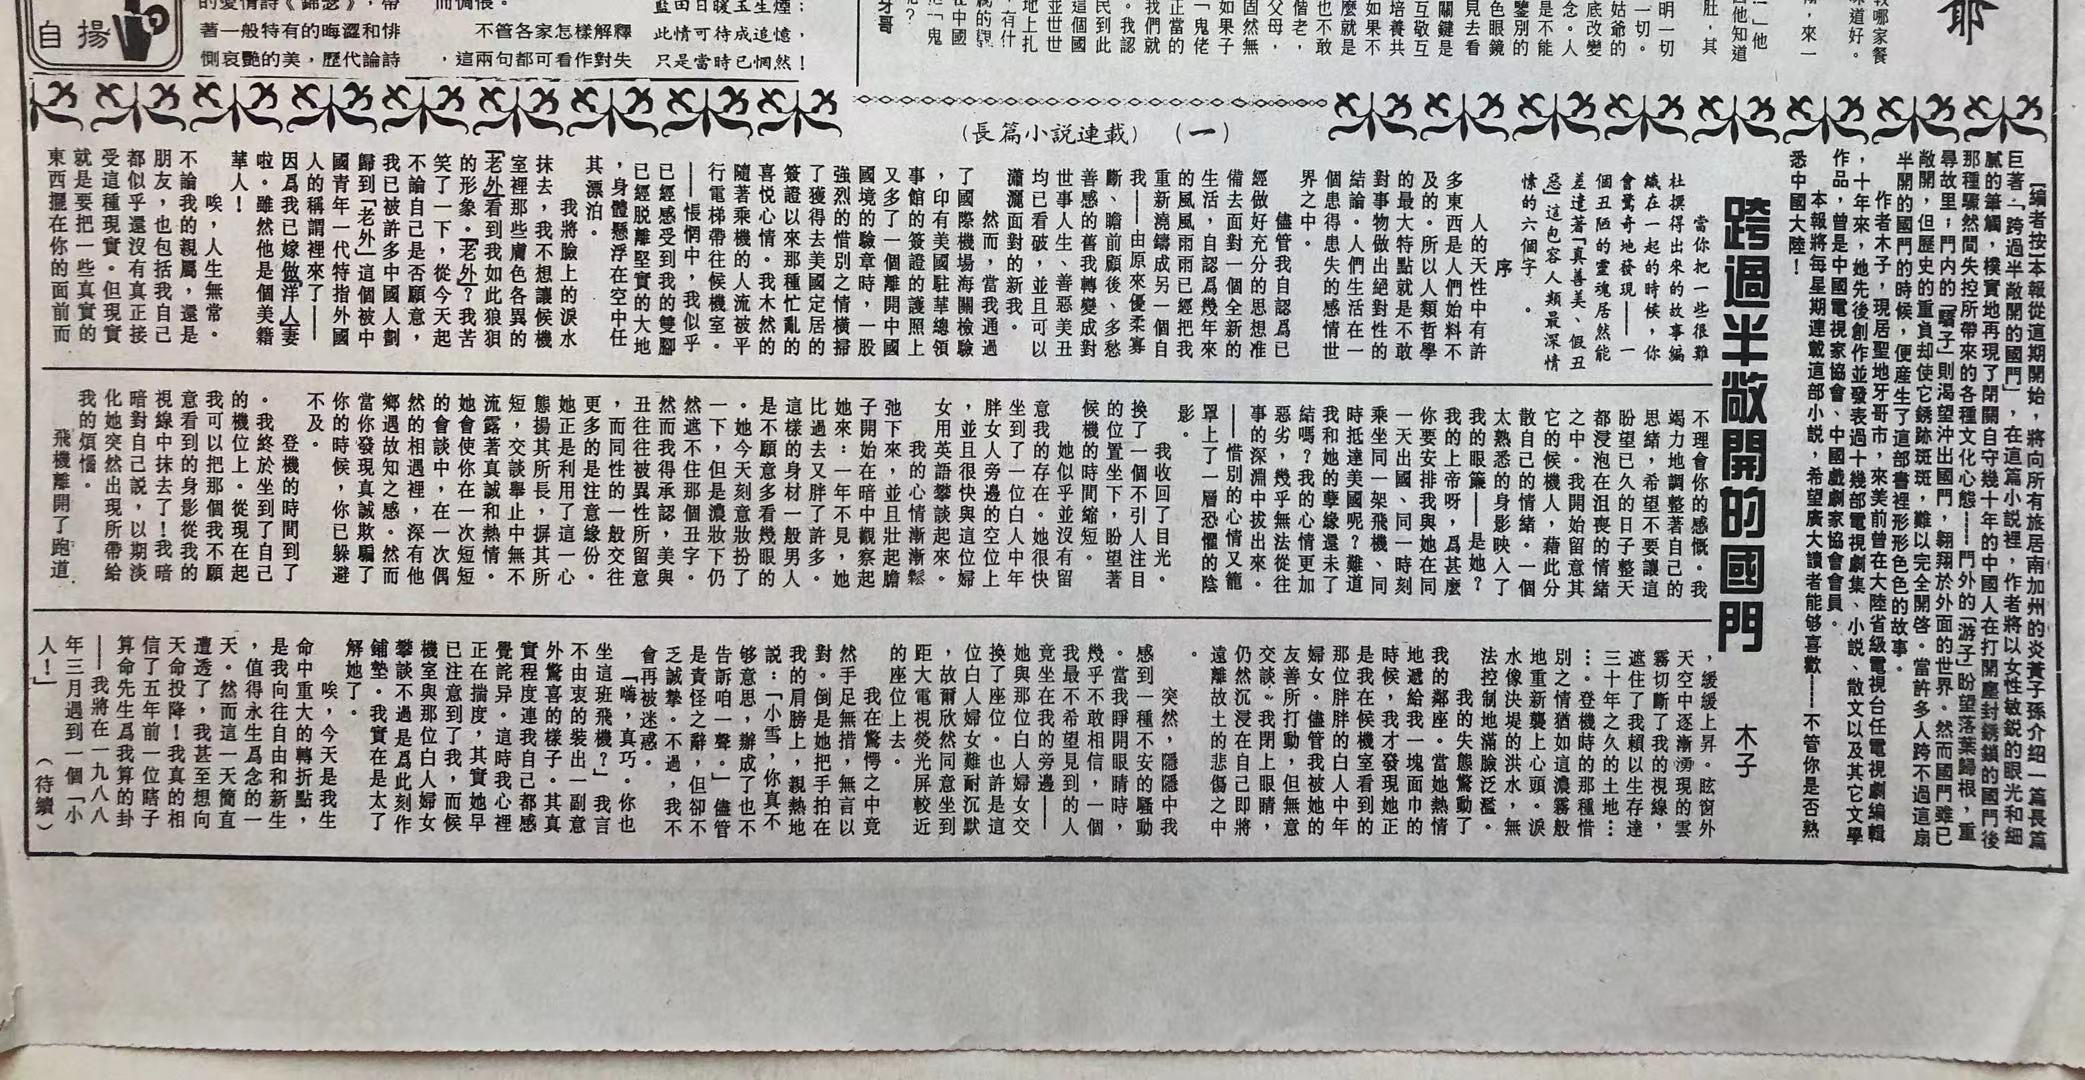 1994年5月27日《华美时报》